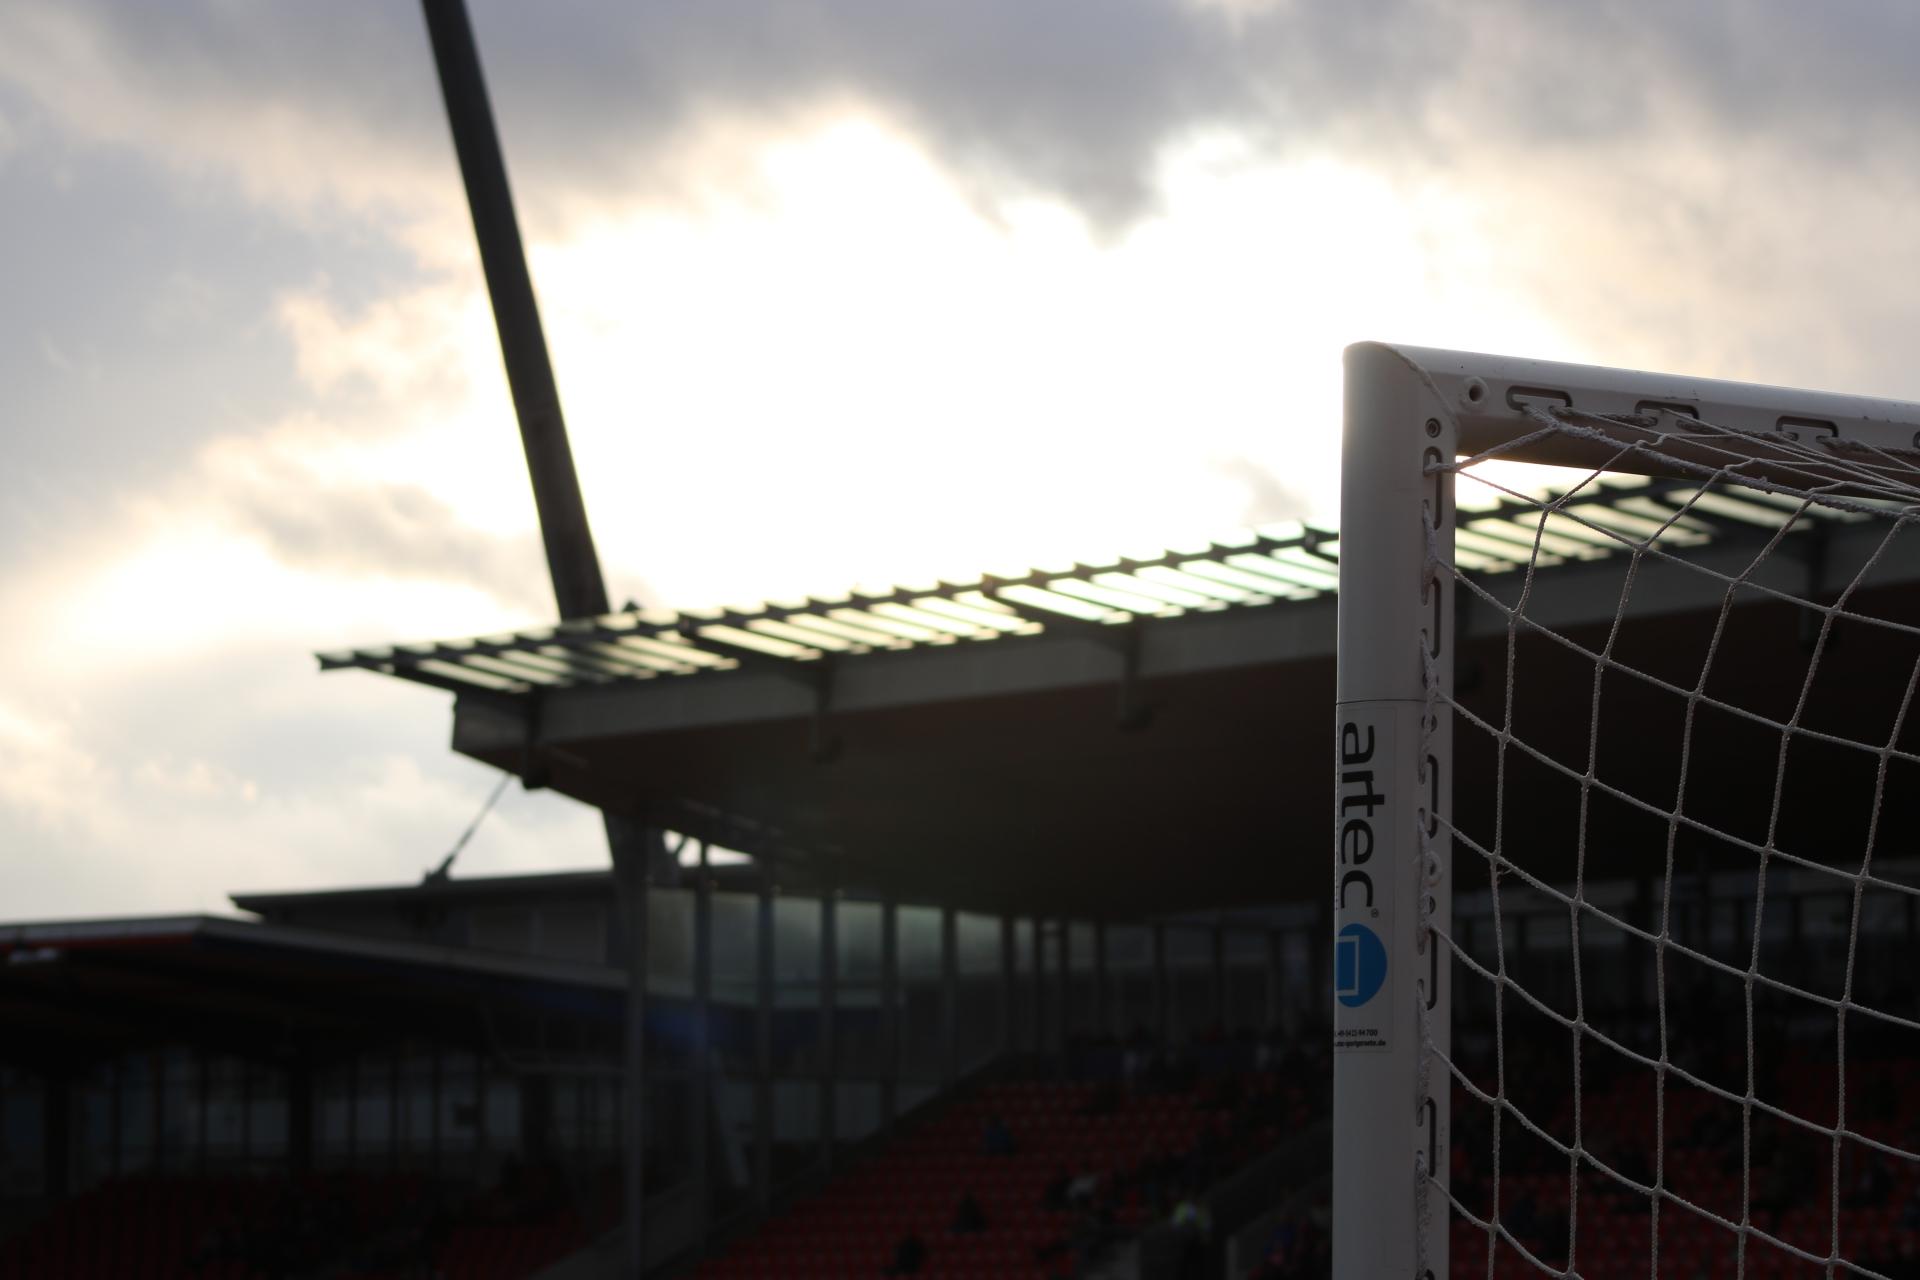 Lotto Hessenliga 2019/2020, KSV Hessen Kassel, FV Bad Vilbel, Endstand 6:1, Auestadion